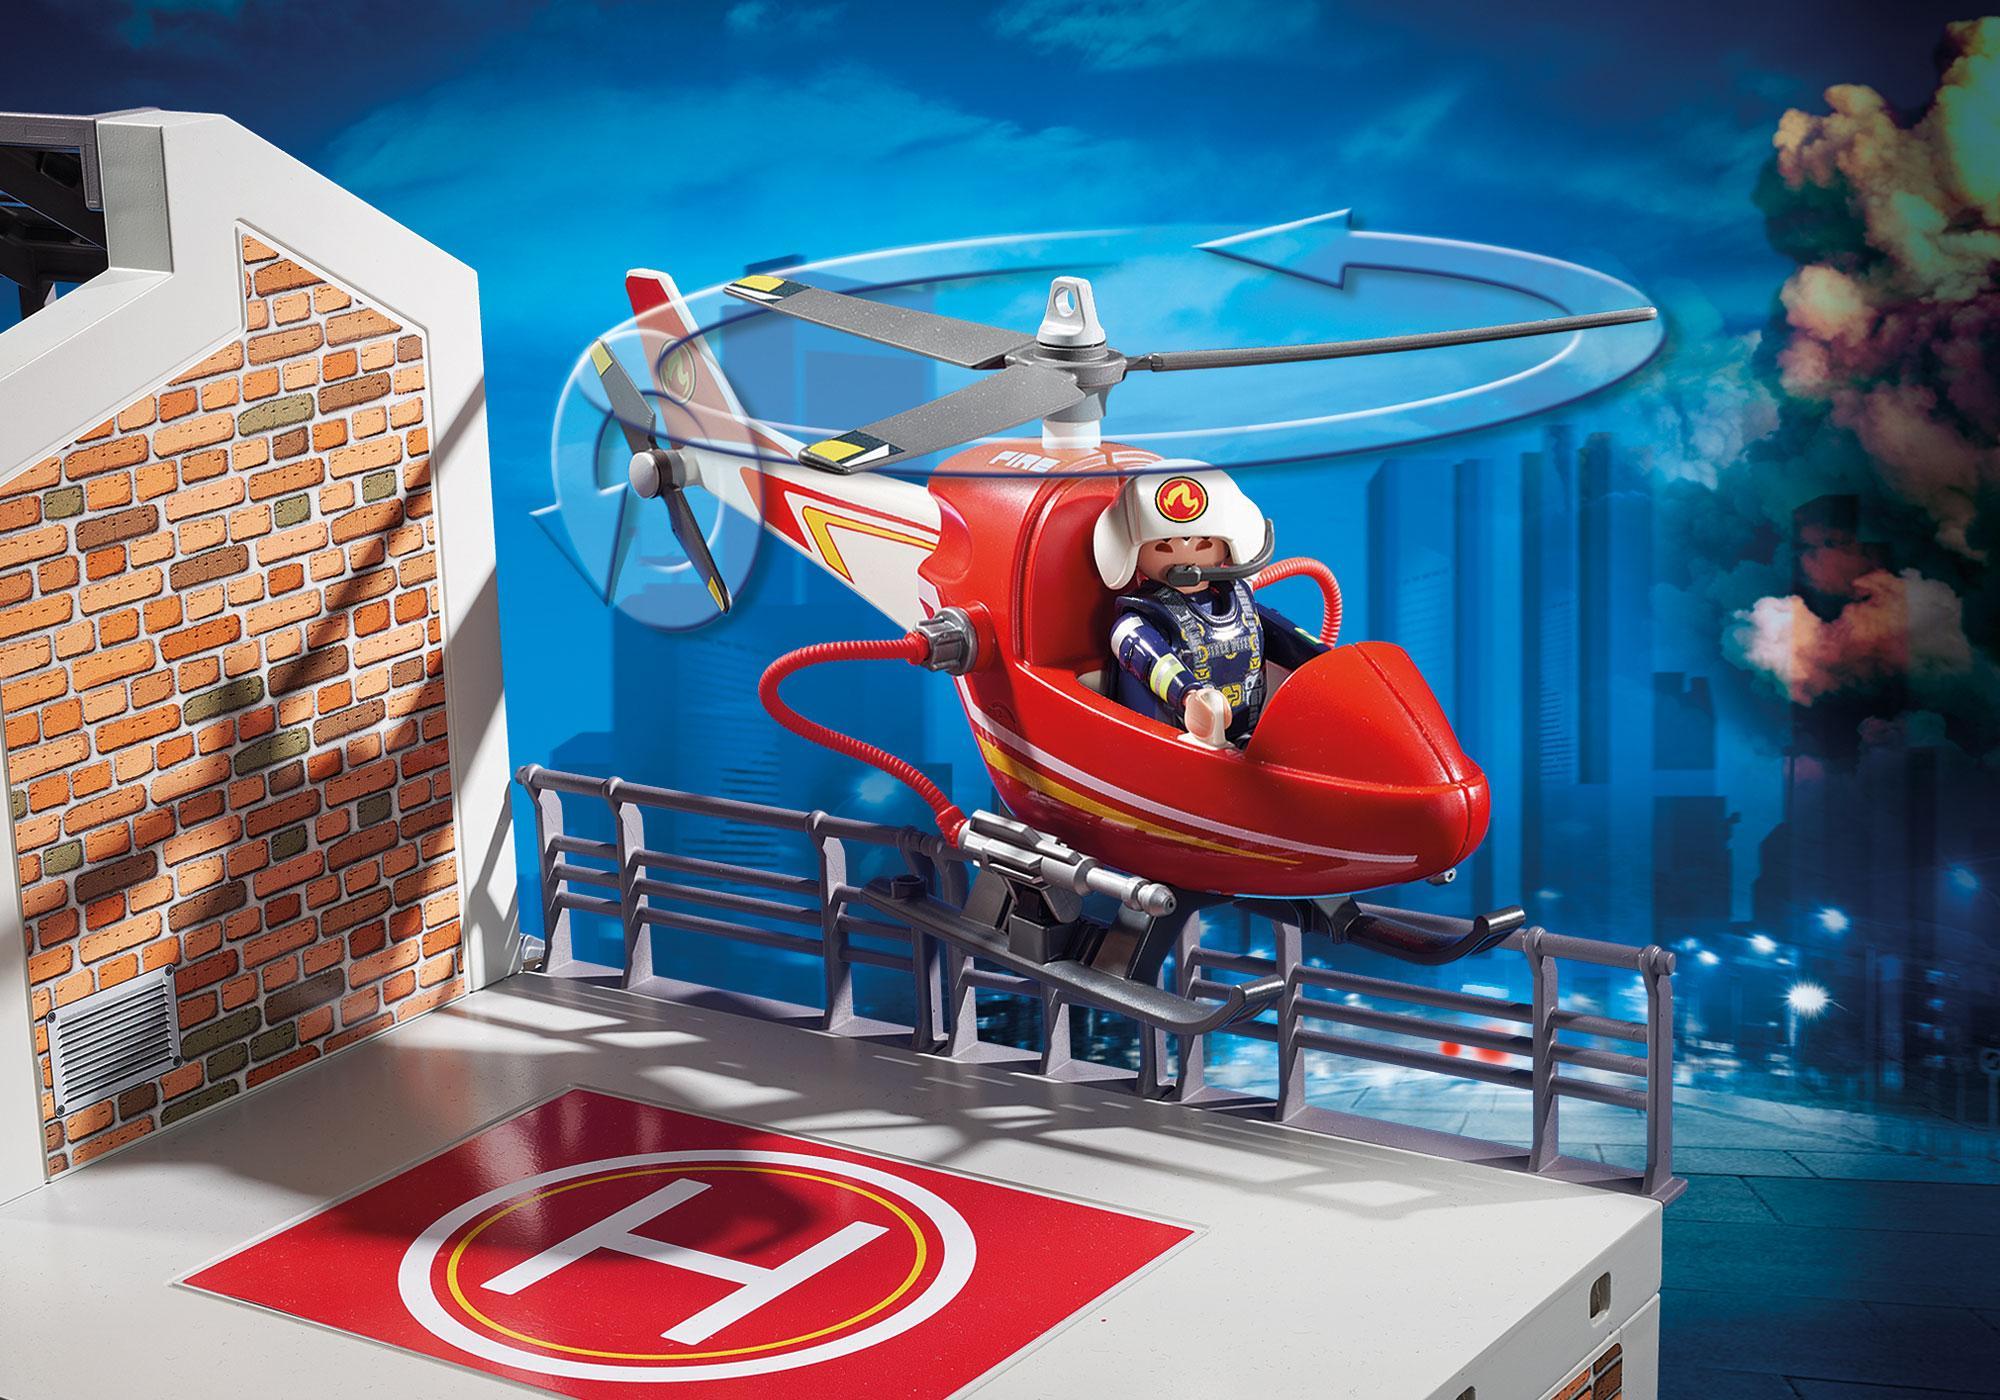 http://media.playmobil.com/i/playmobil/9462_product_extra1/Große Feuerwache